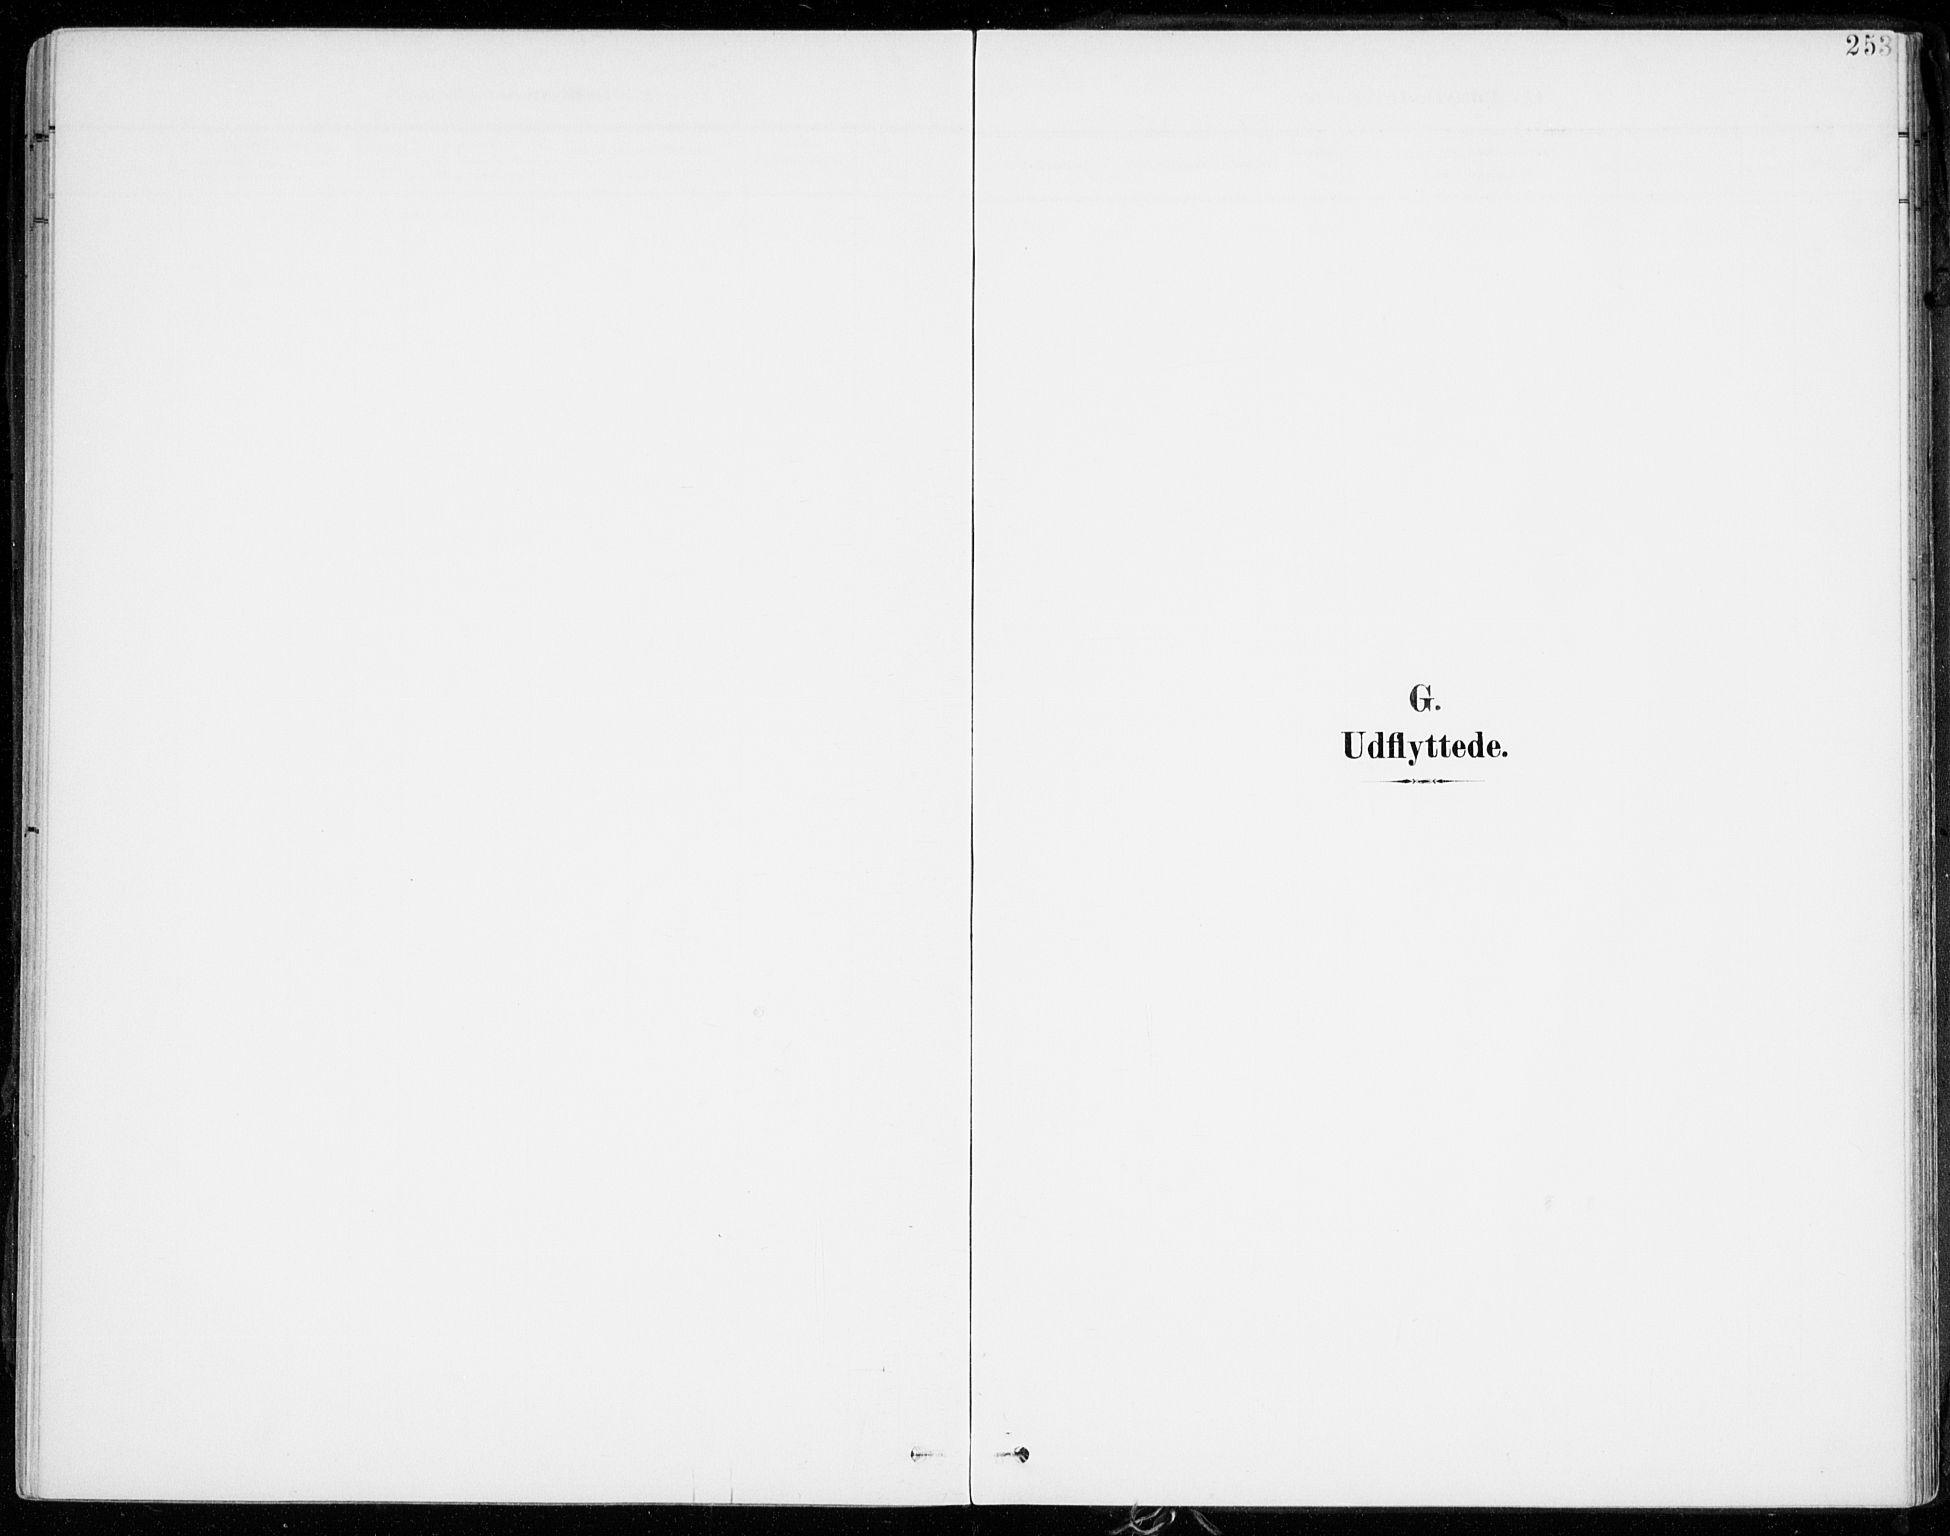 SATØ, Lenvik sokneprestembete, H/Ha: Ministerialbok nr. 14, 1899-1909, s. 253